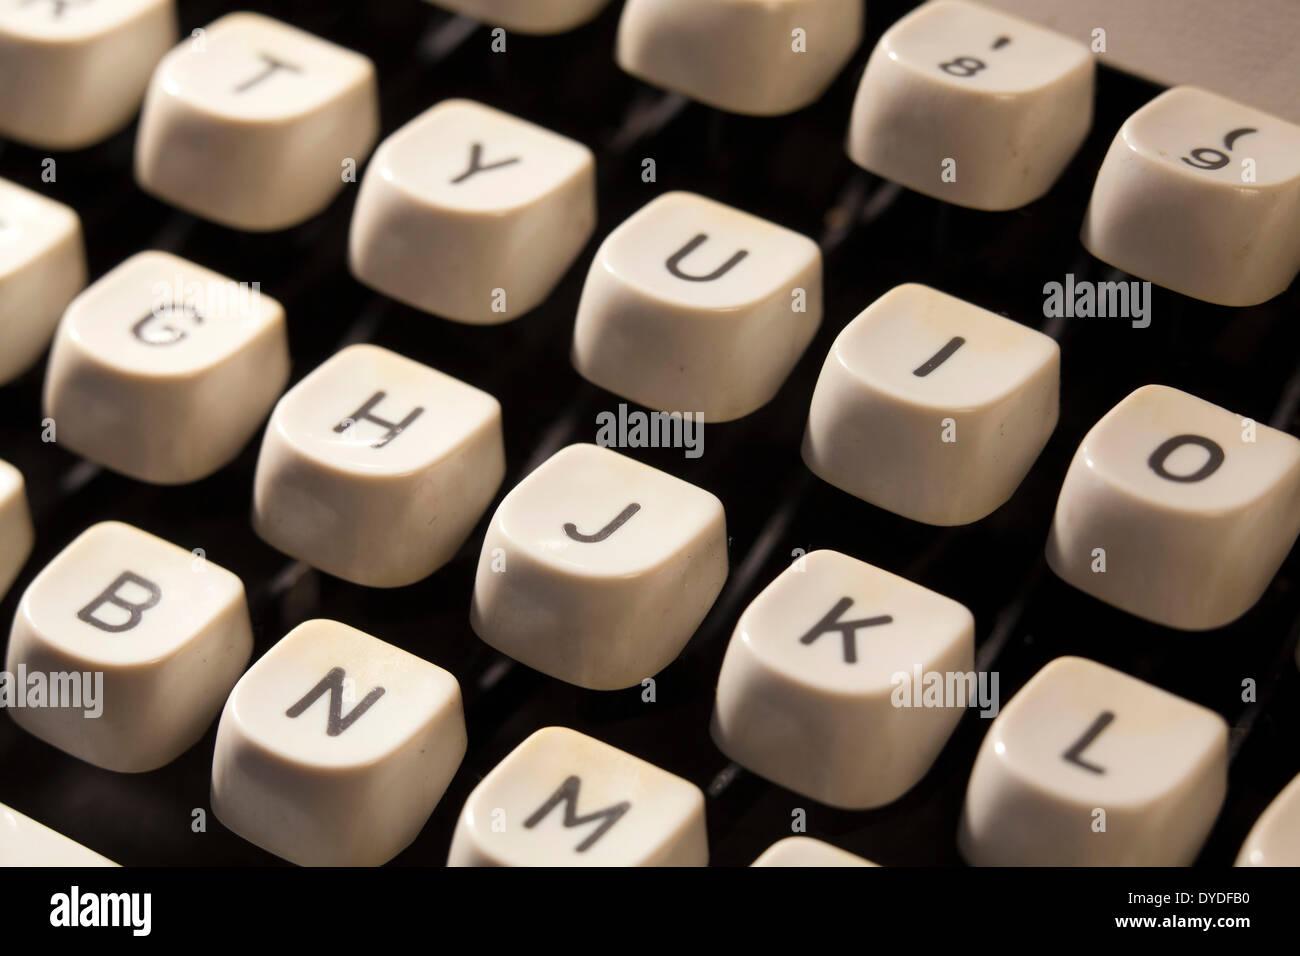 Teclas de máquina de escribir manual de cerca. Foto de stock